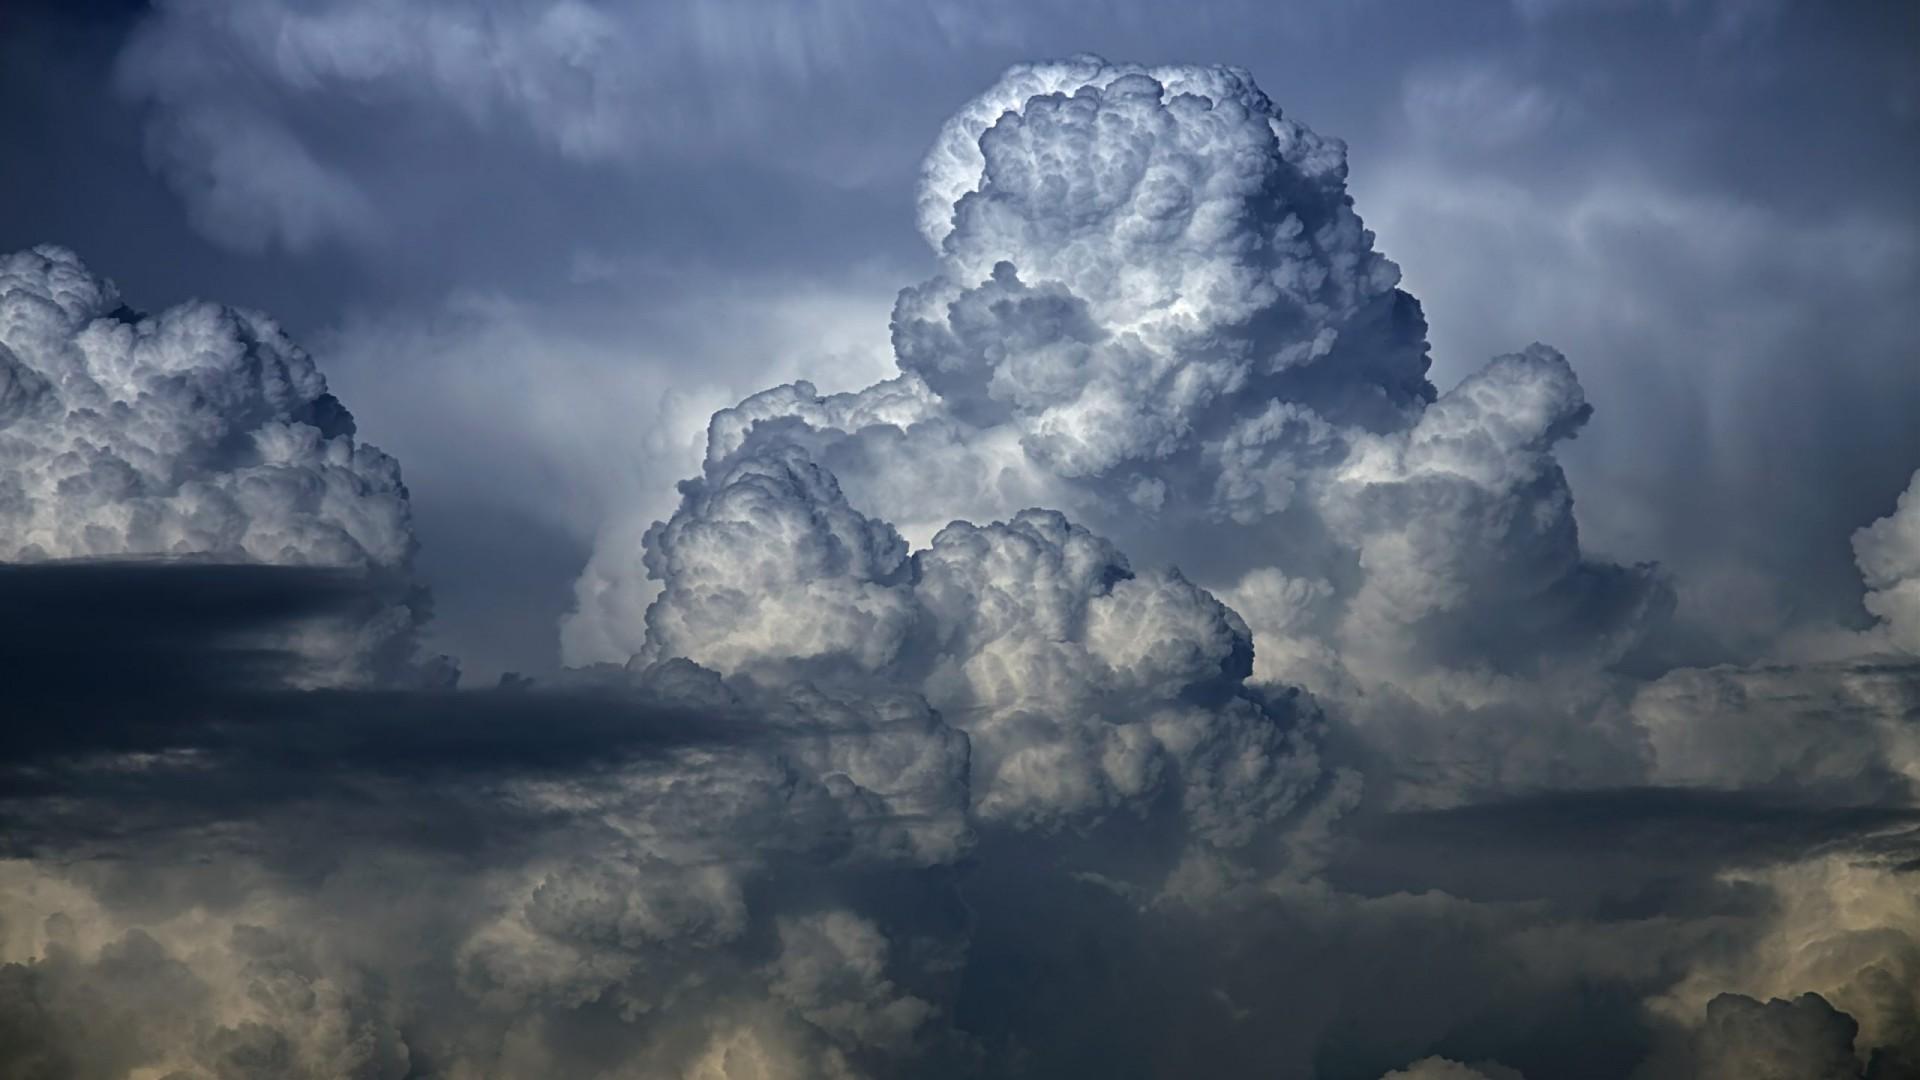 big-dark-beautiful-clouds-wallpaper jpg (1920×1080) | clouds